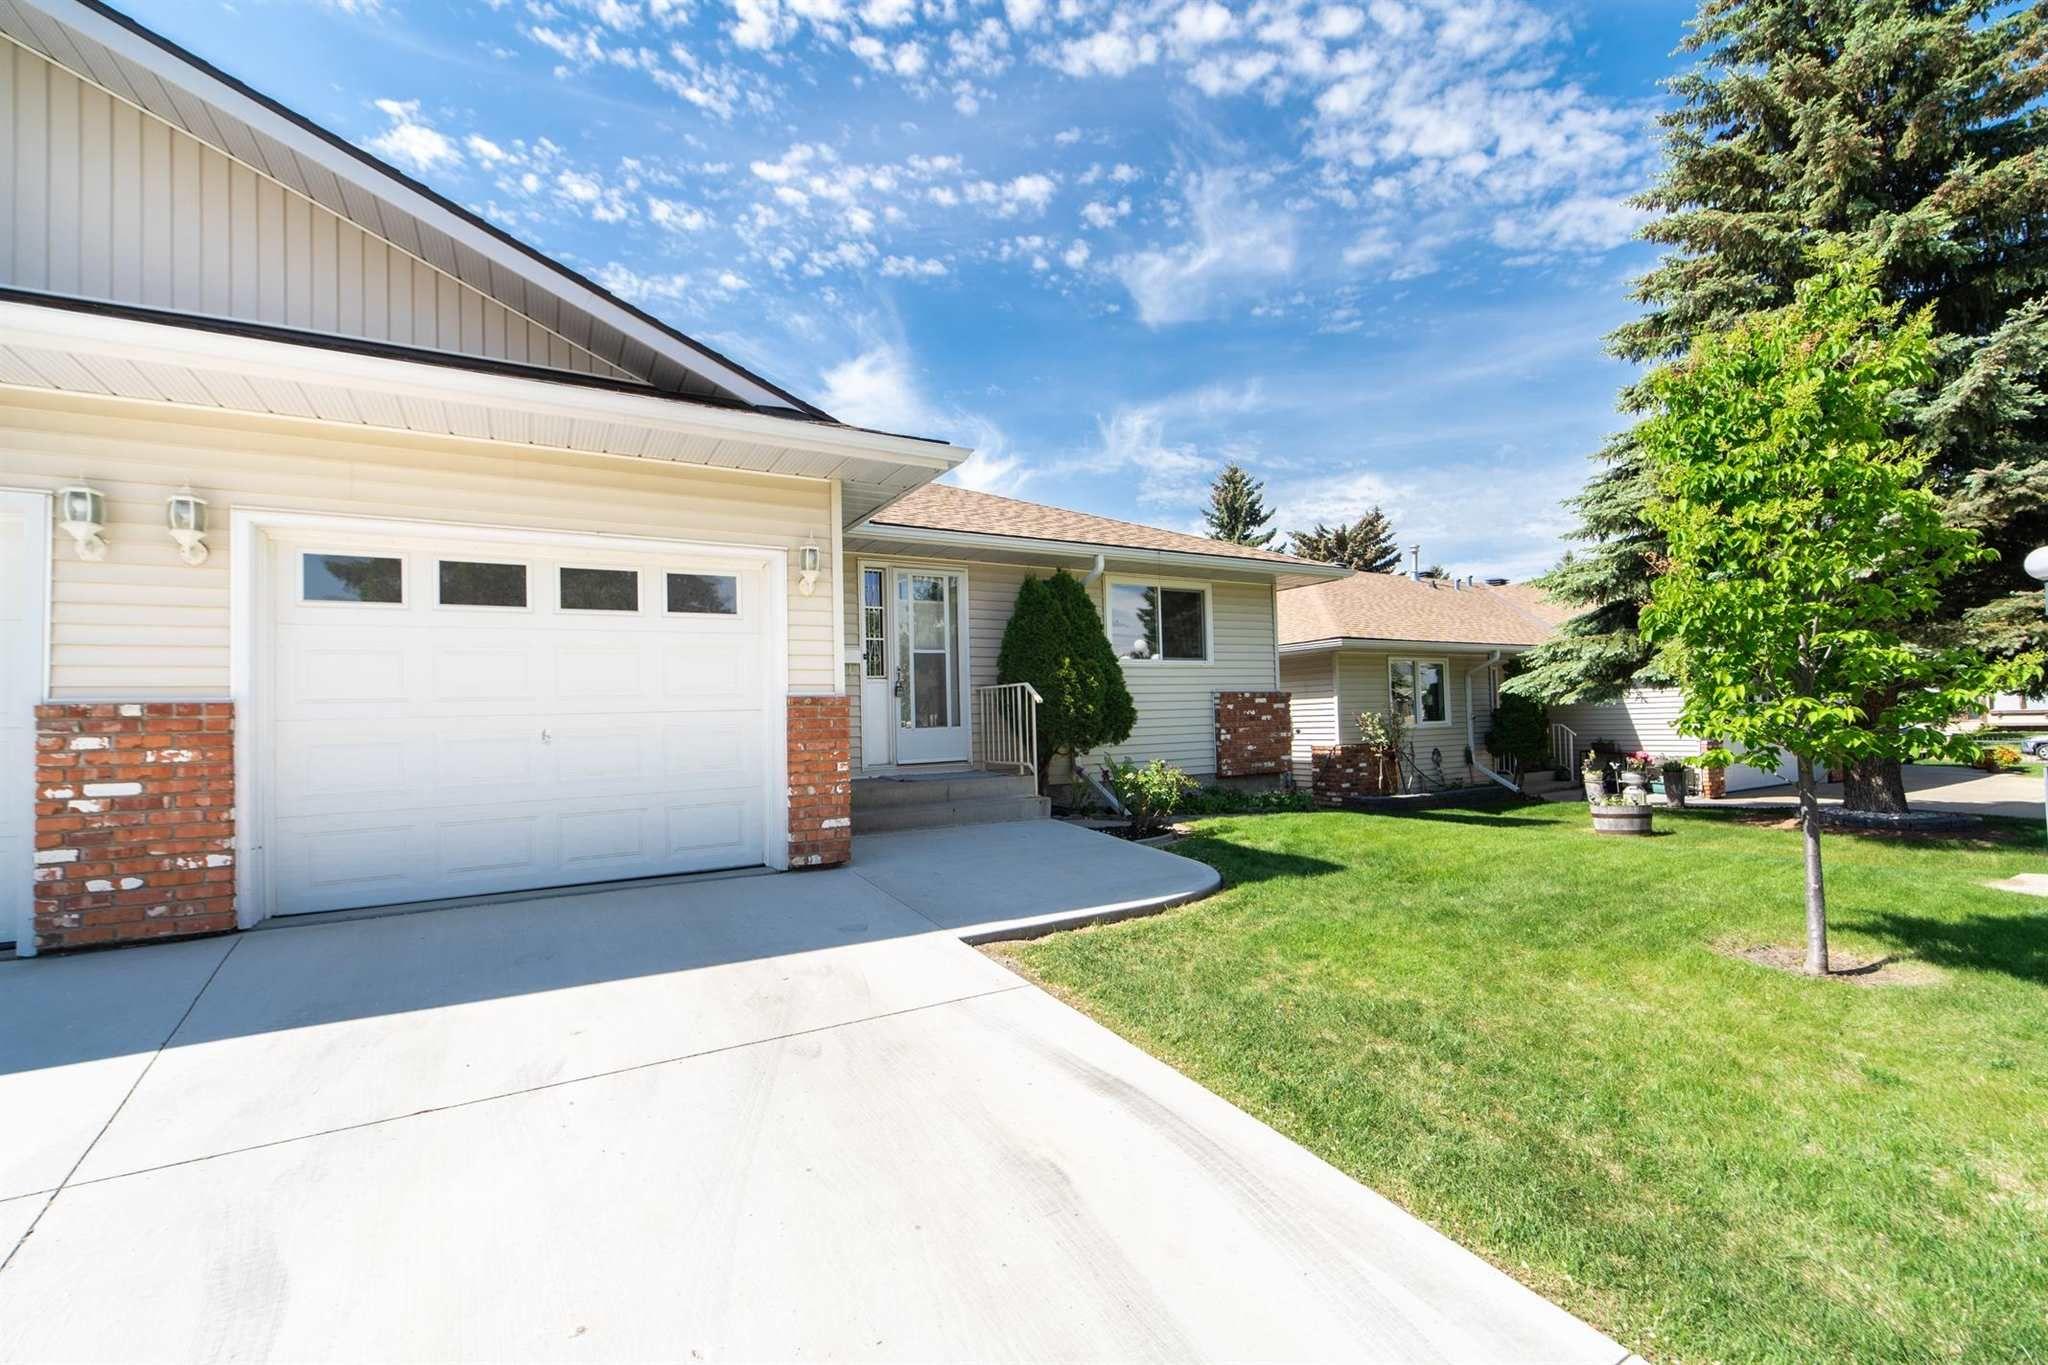 Main Photo: 1507 62 Street in Edmonton: Zone 29 House Half Duplex for sale : MLS®# E4262734